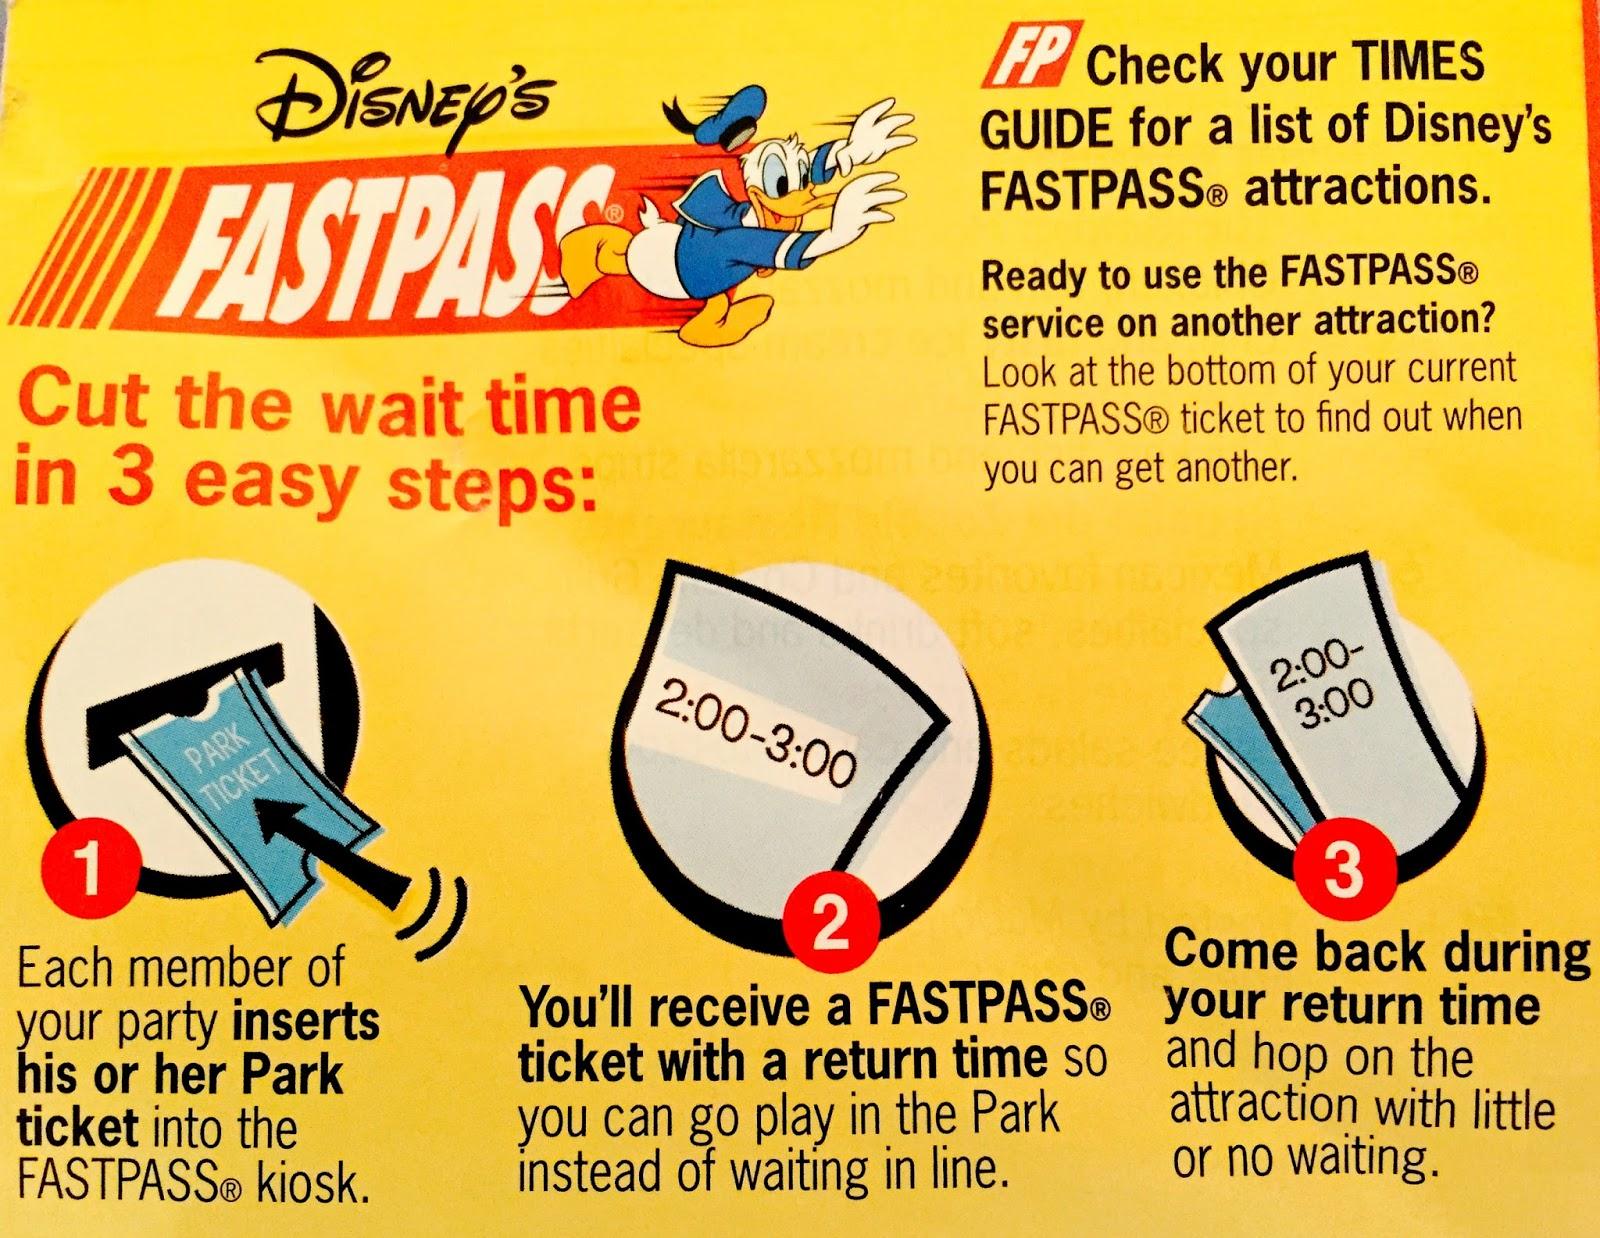 FASTPASS to Disneyland 1999 - Post 50 RX